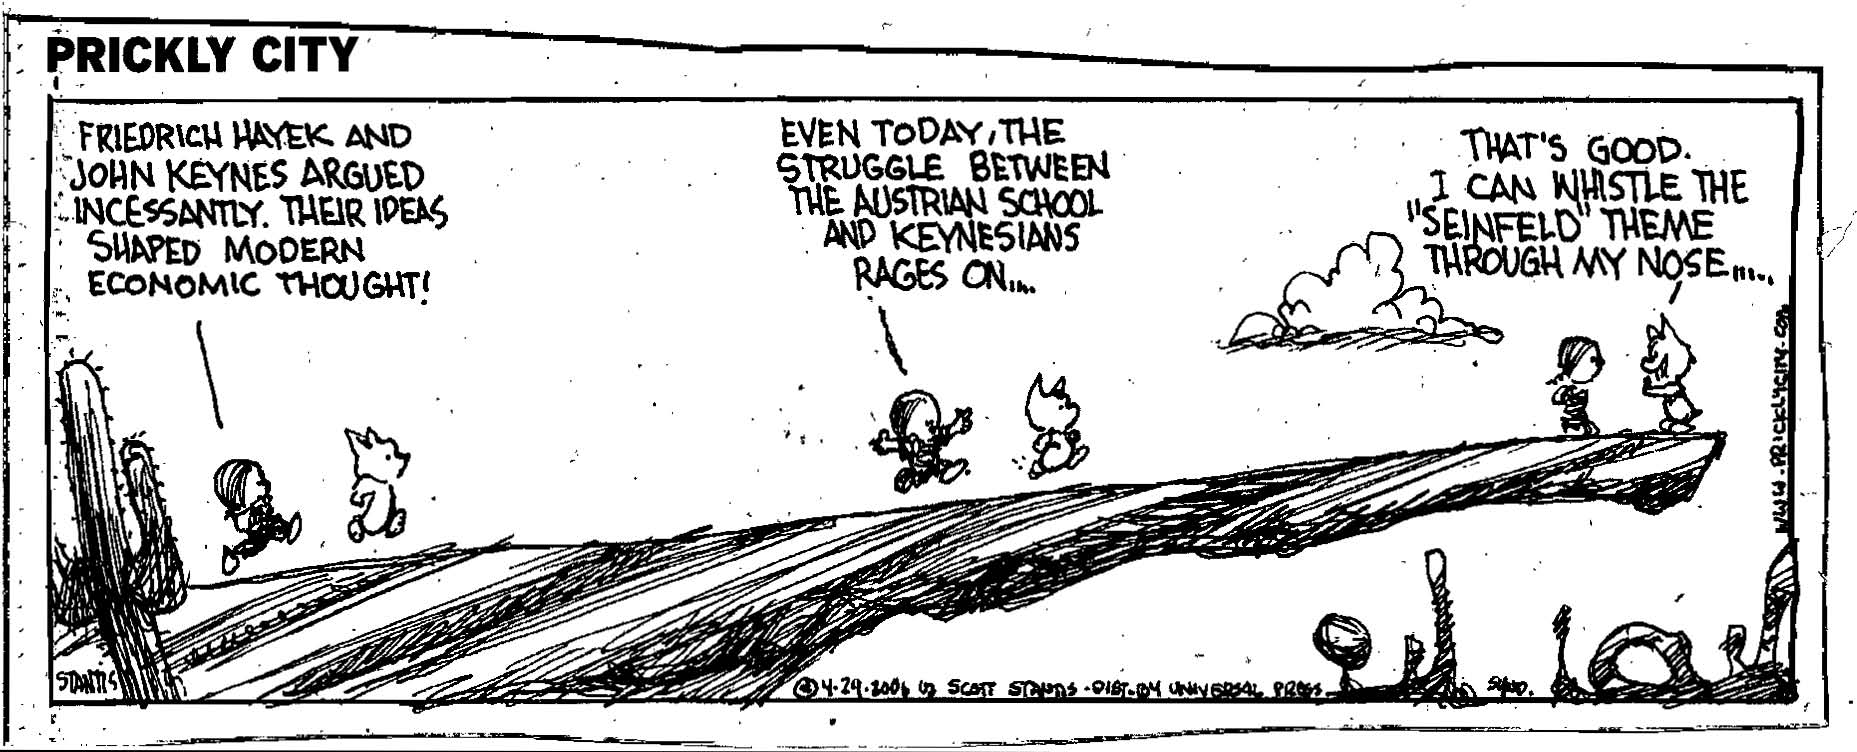 Keynes vs. Hayek/ Altruism vs. Self-Interest (Raymond